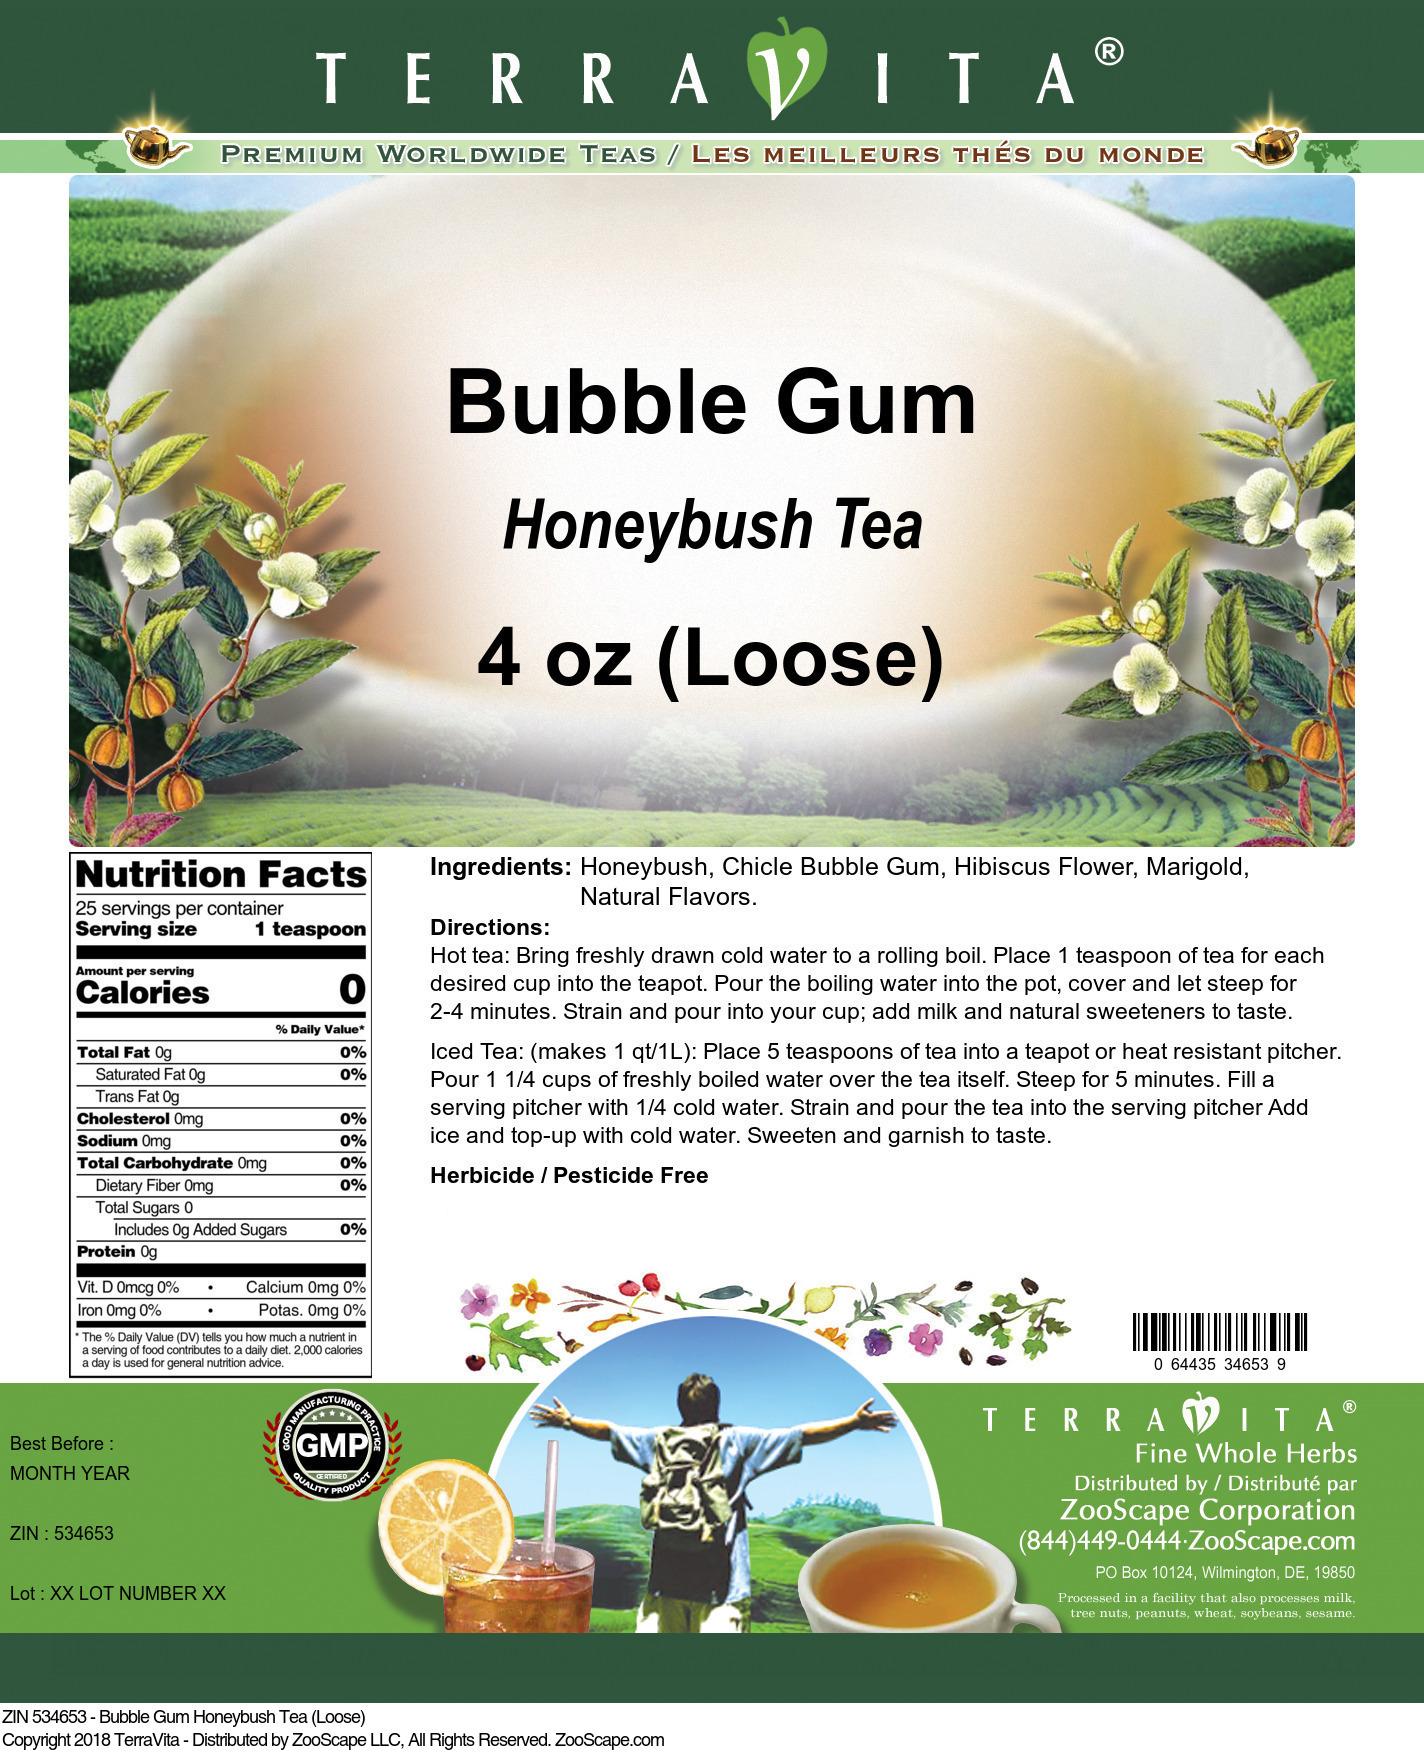 Bubble Gum Honeybush Tea (Loose)